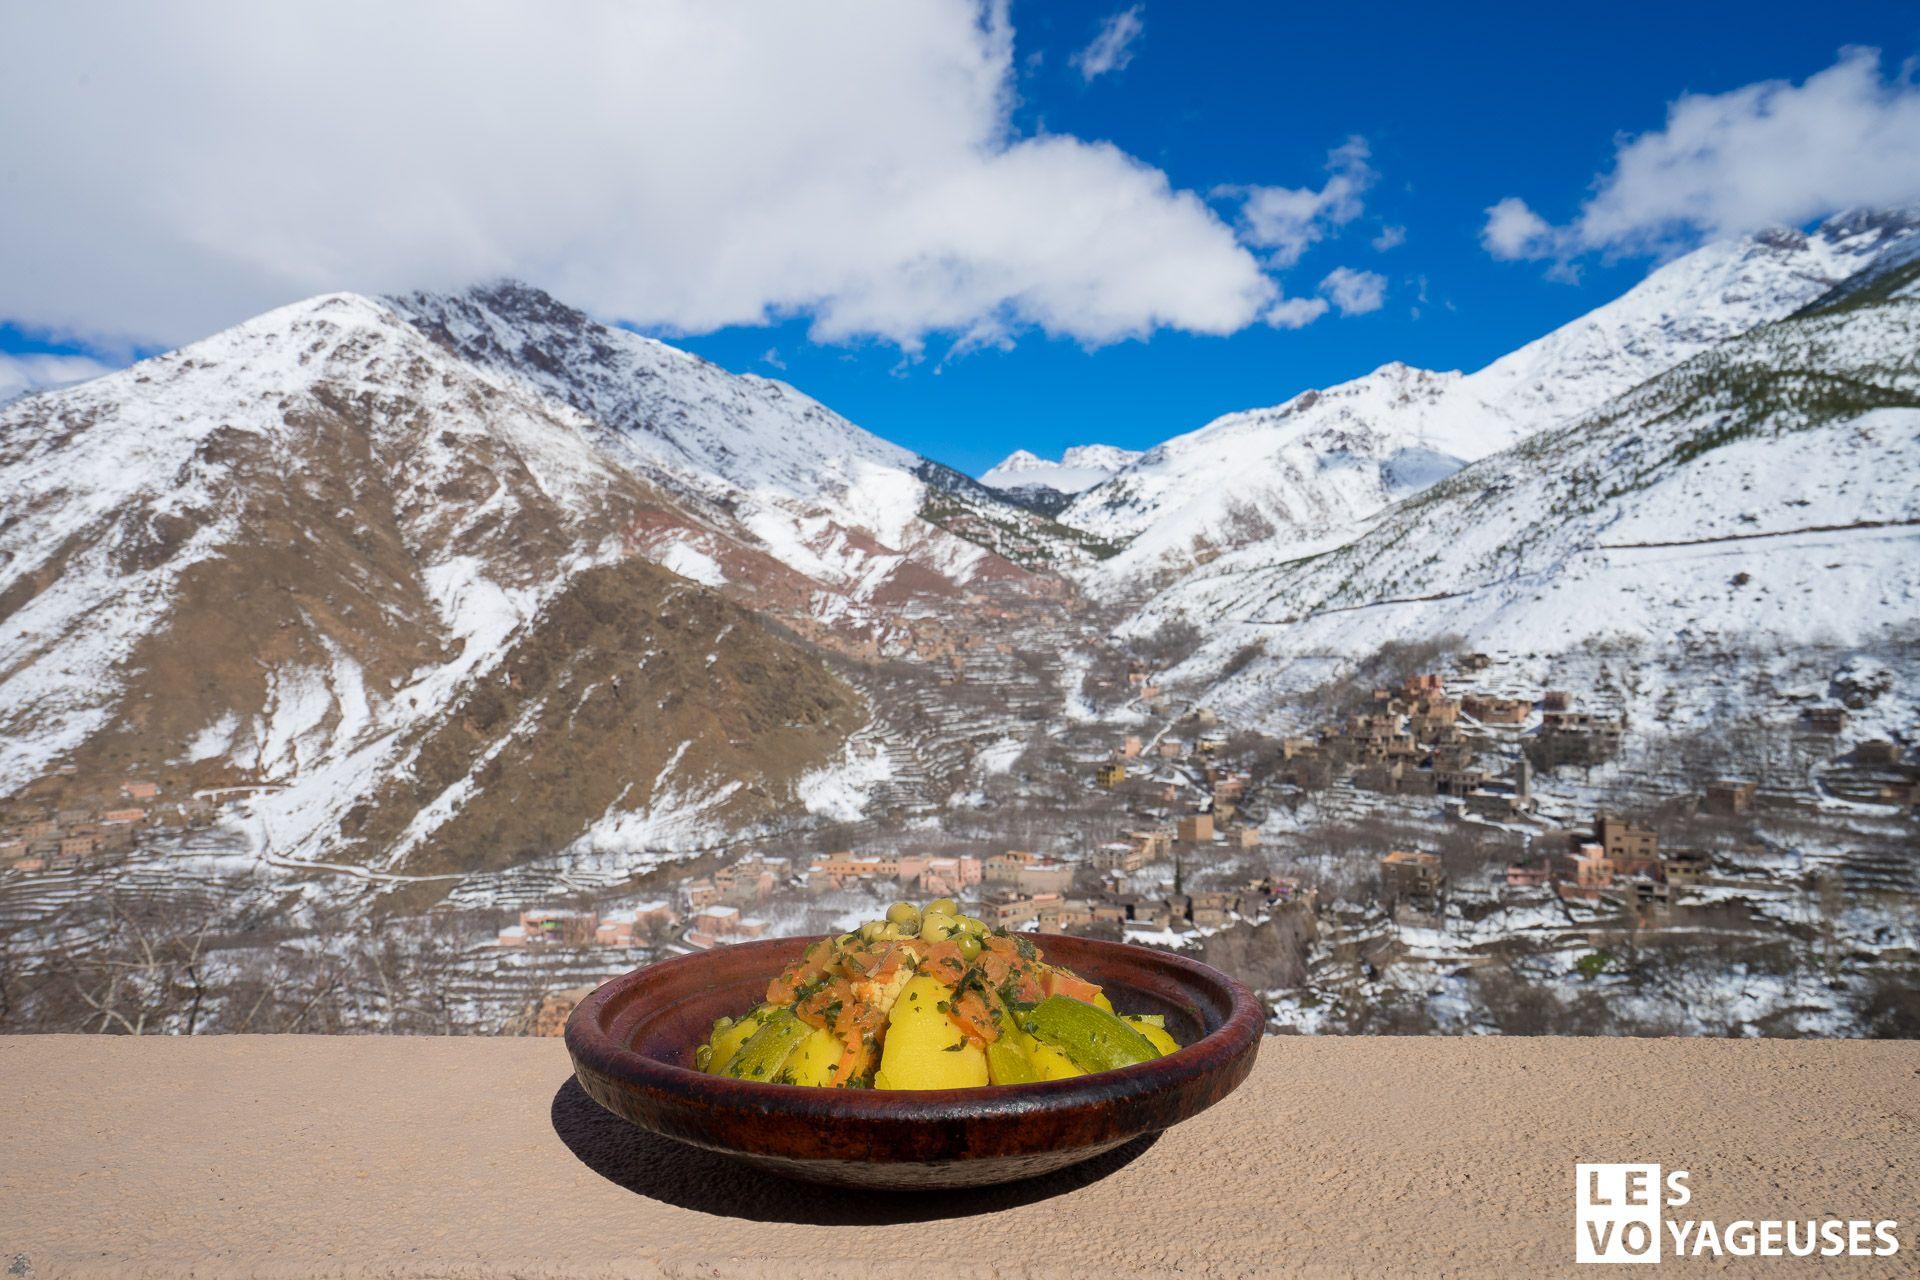 Les-voyageuses-maroc-imlil-hiver-09791